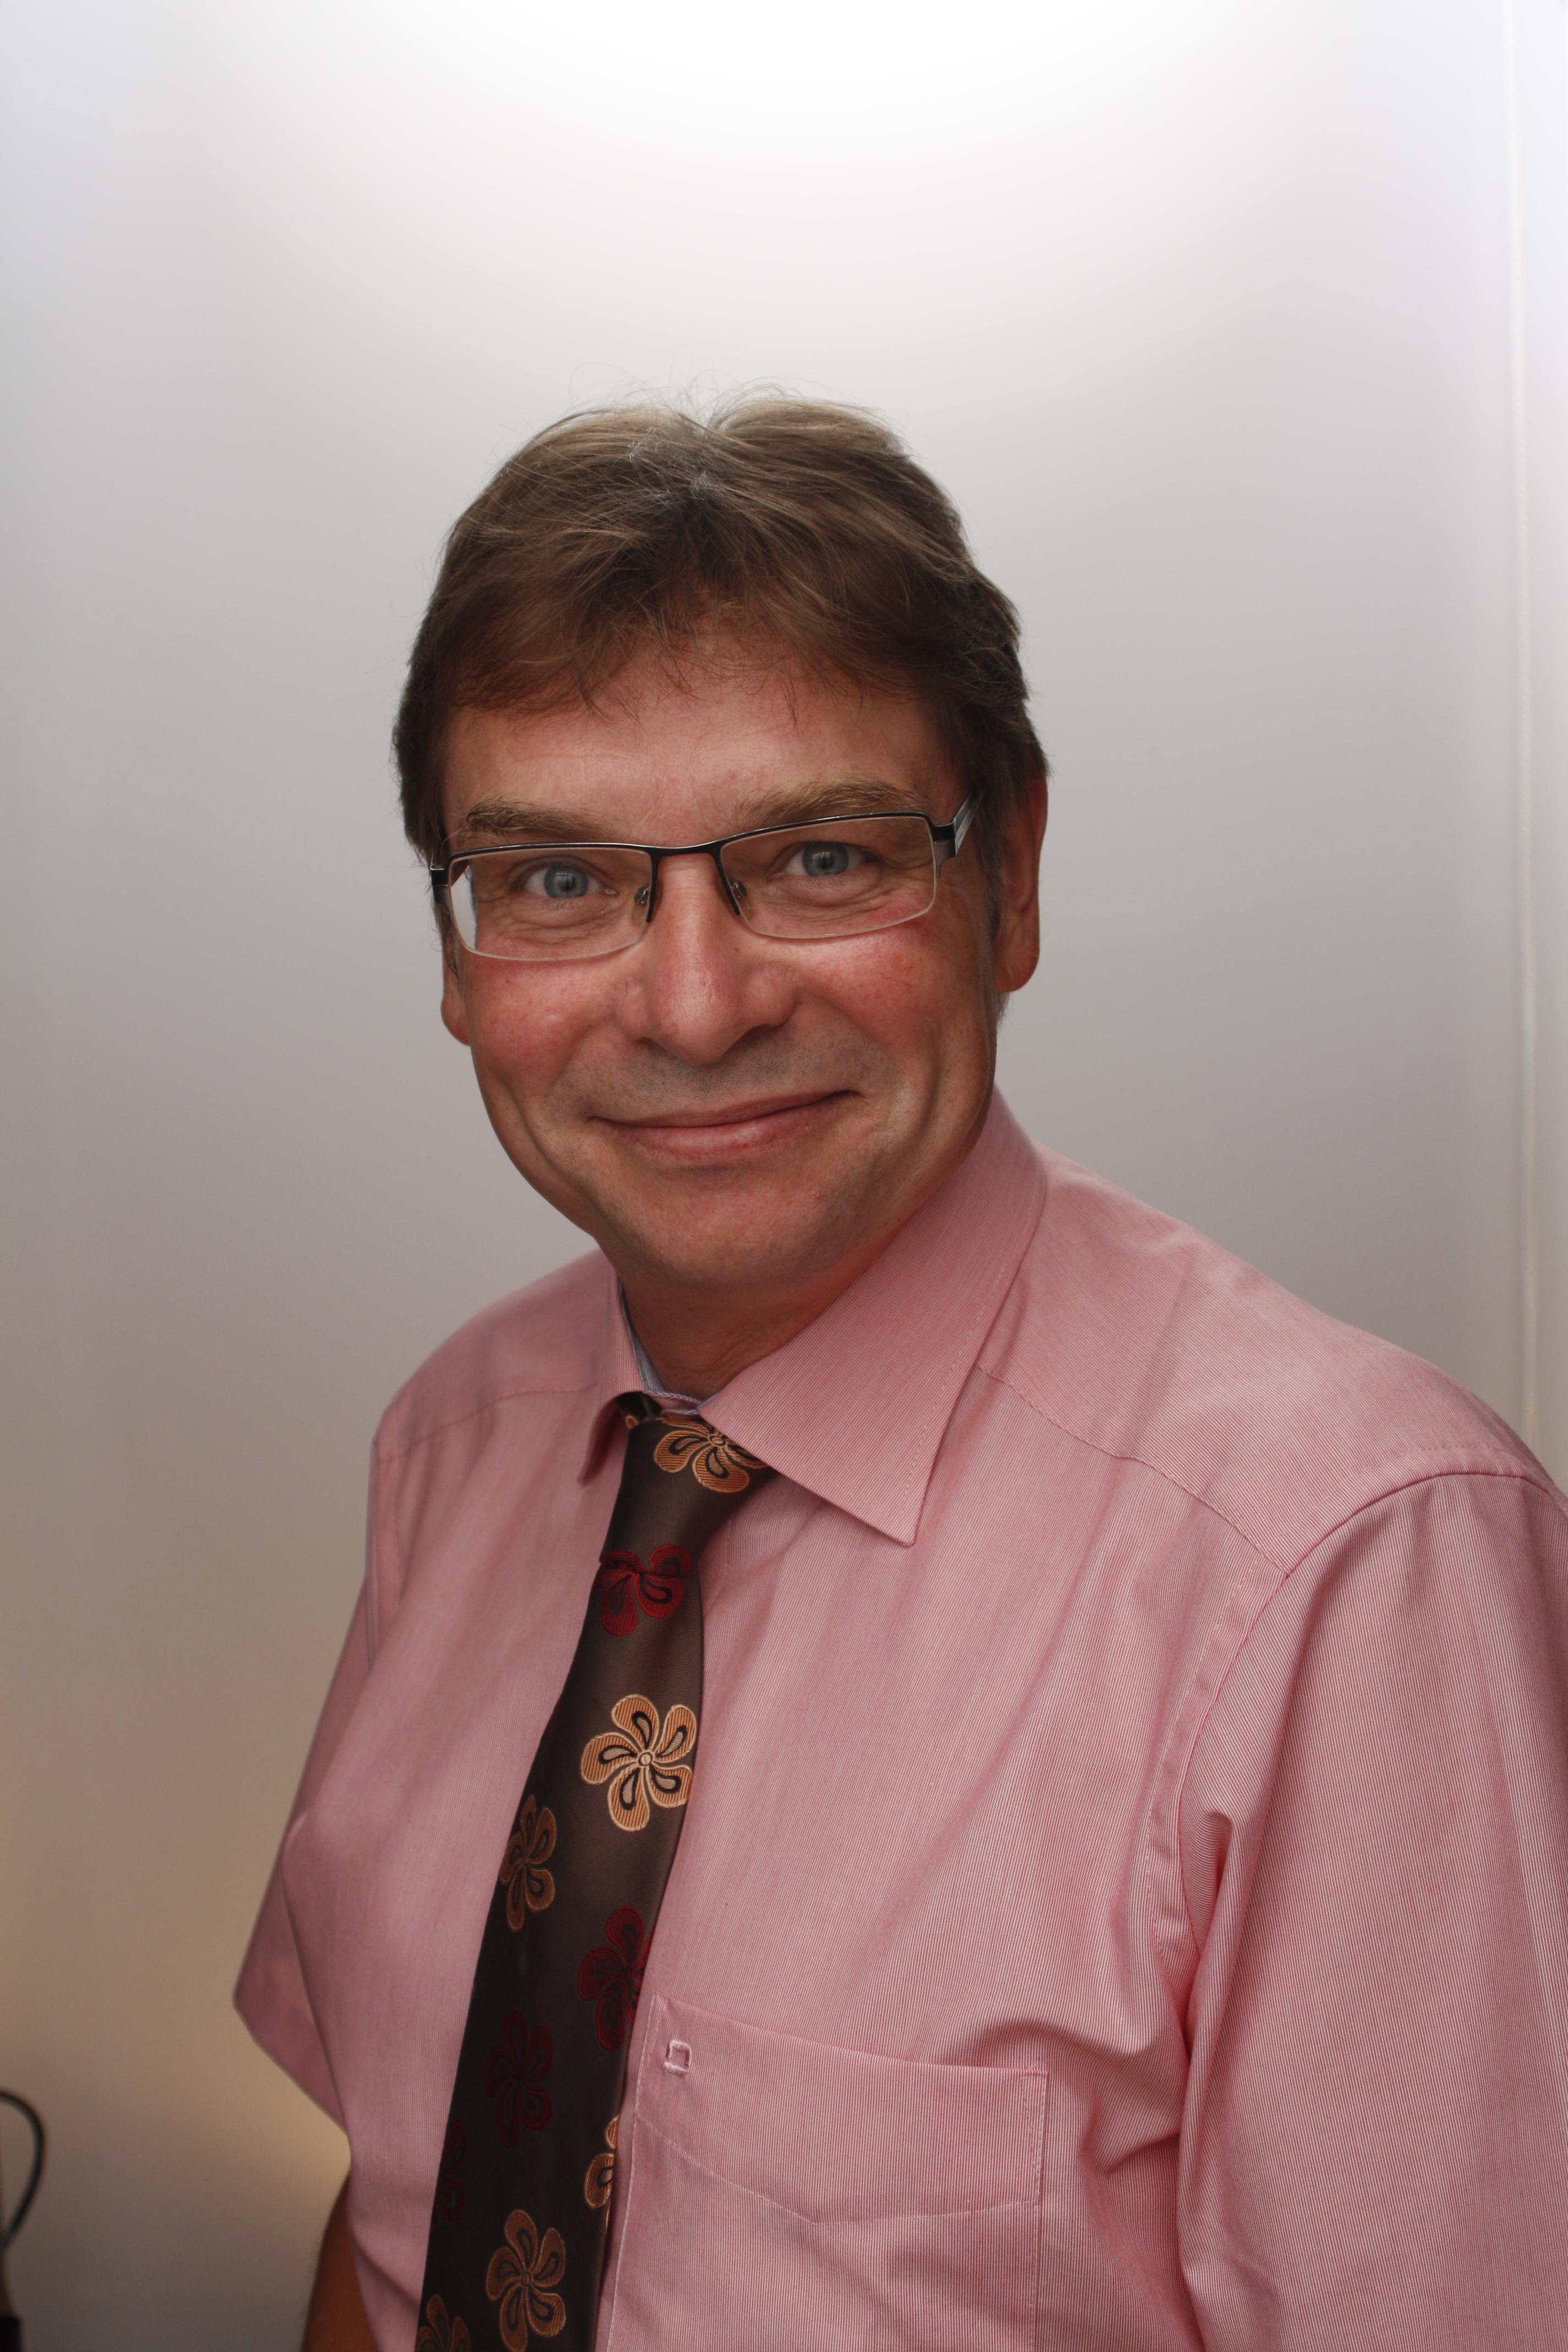 Harald Keltsch